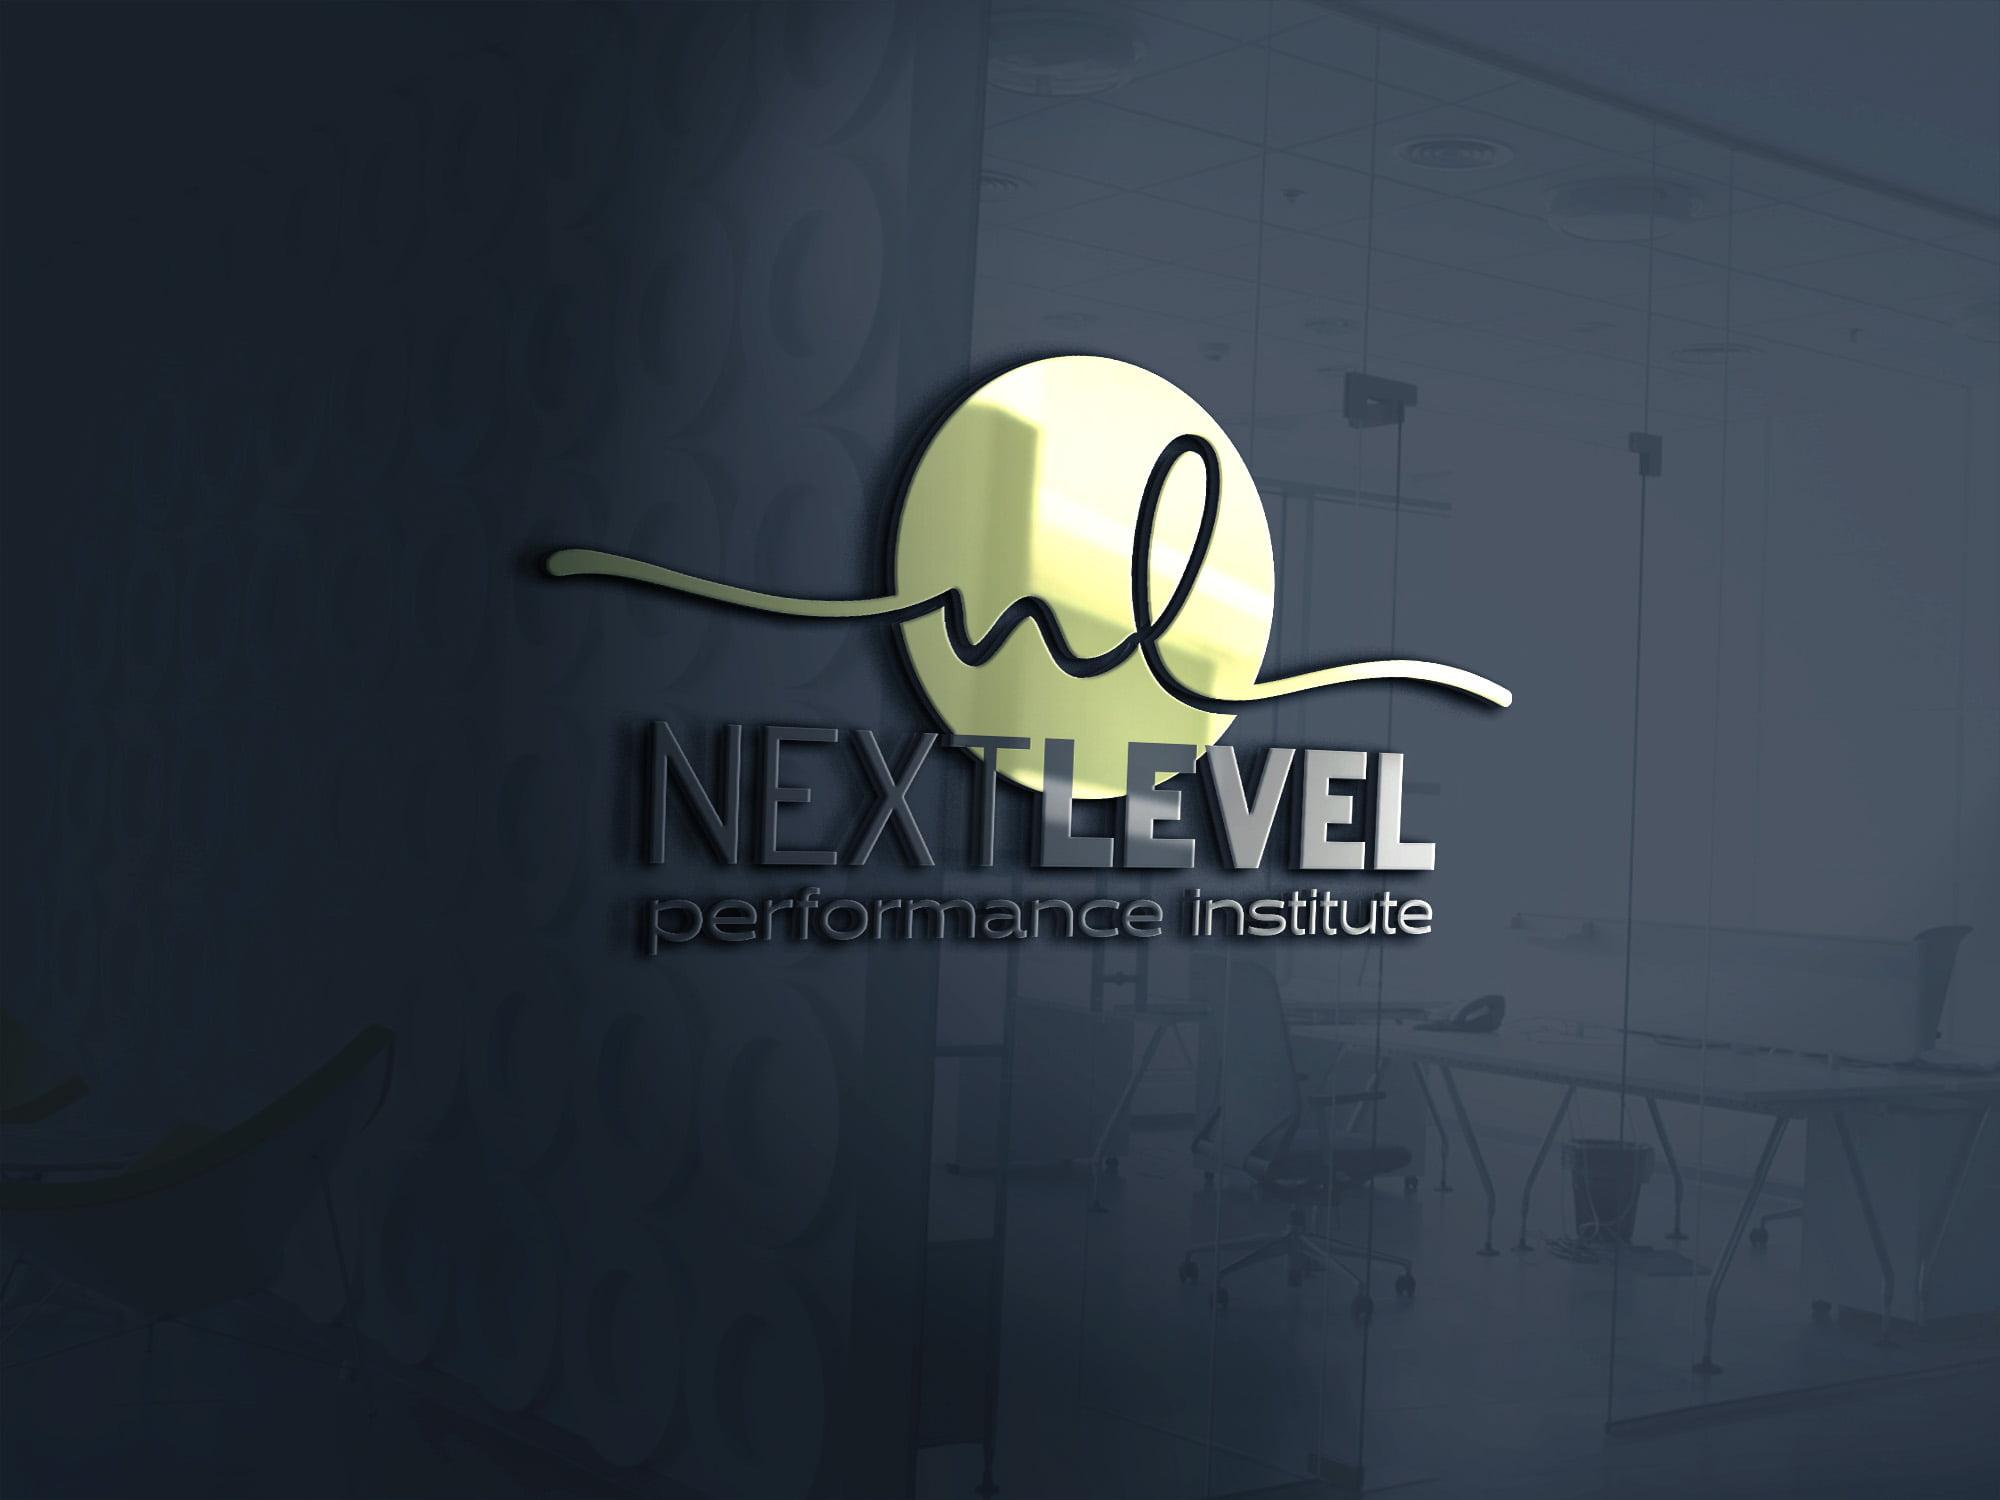 Nextlevel logo 2